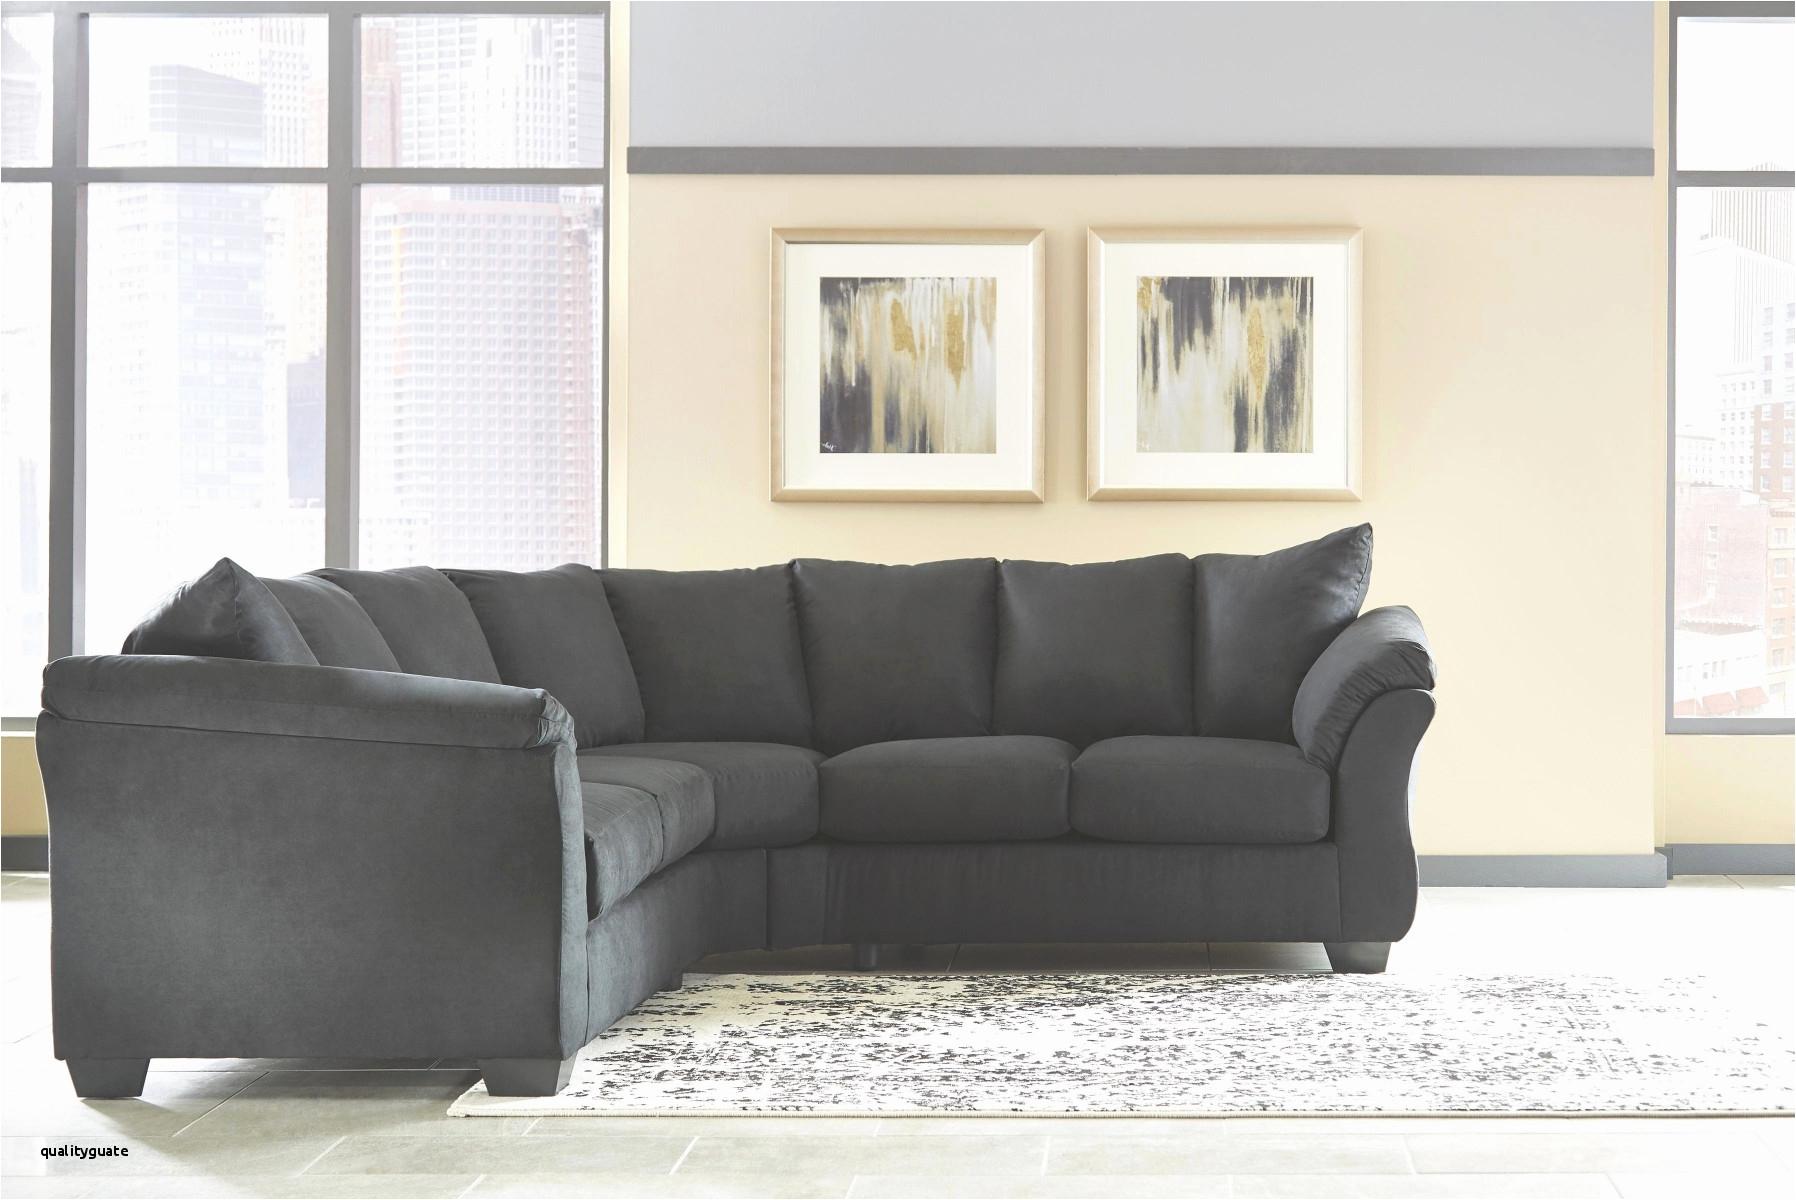 Affordable Sectional sofas Awesome Brown sofa Beautiful Cor sofa 0d Davidtate